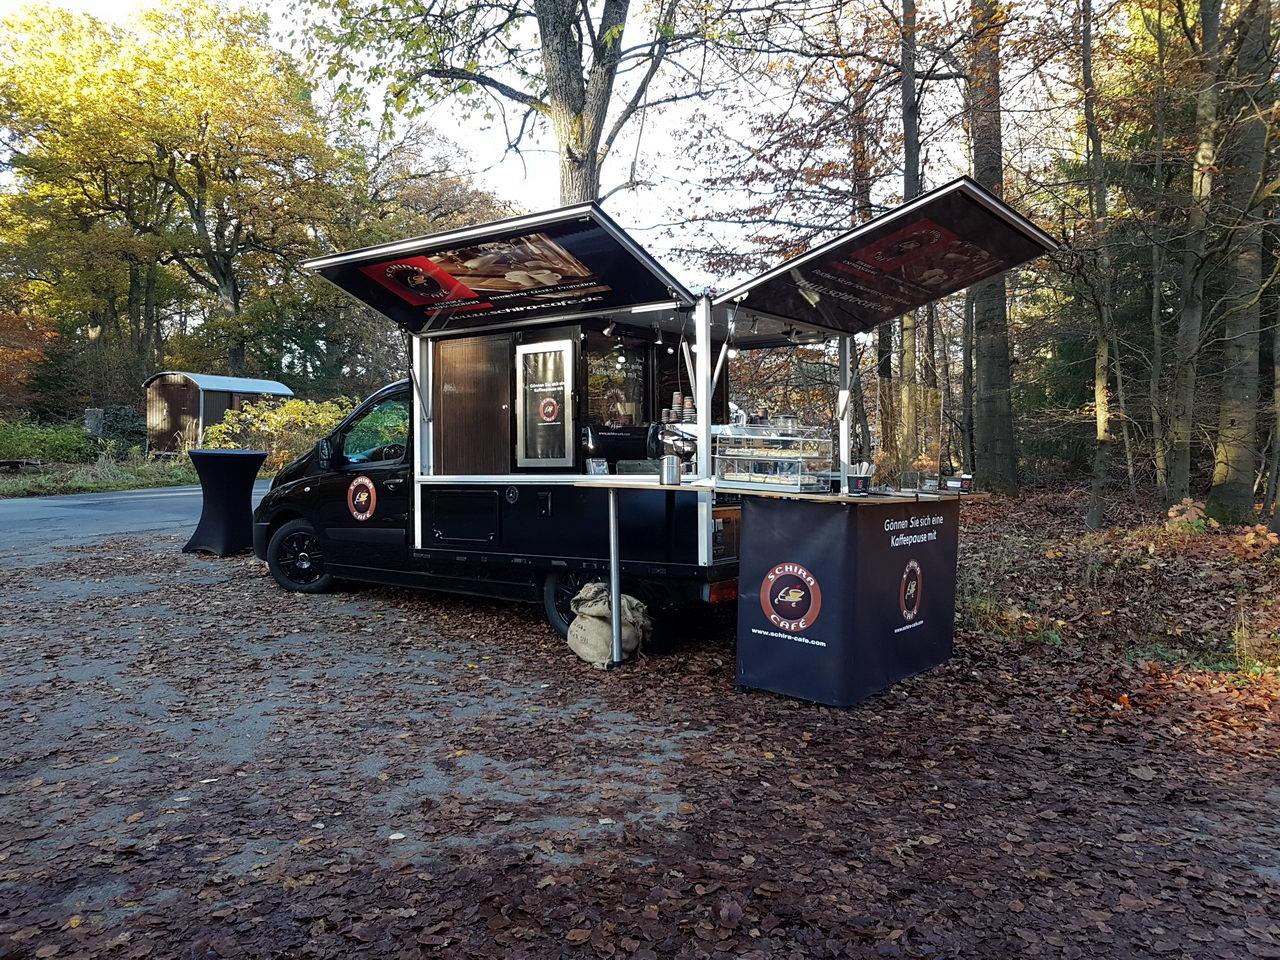 Espressomobil Beerdigung Friedwald Reihardswald